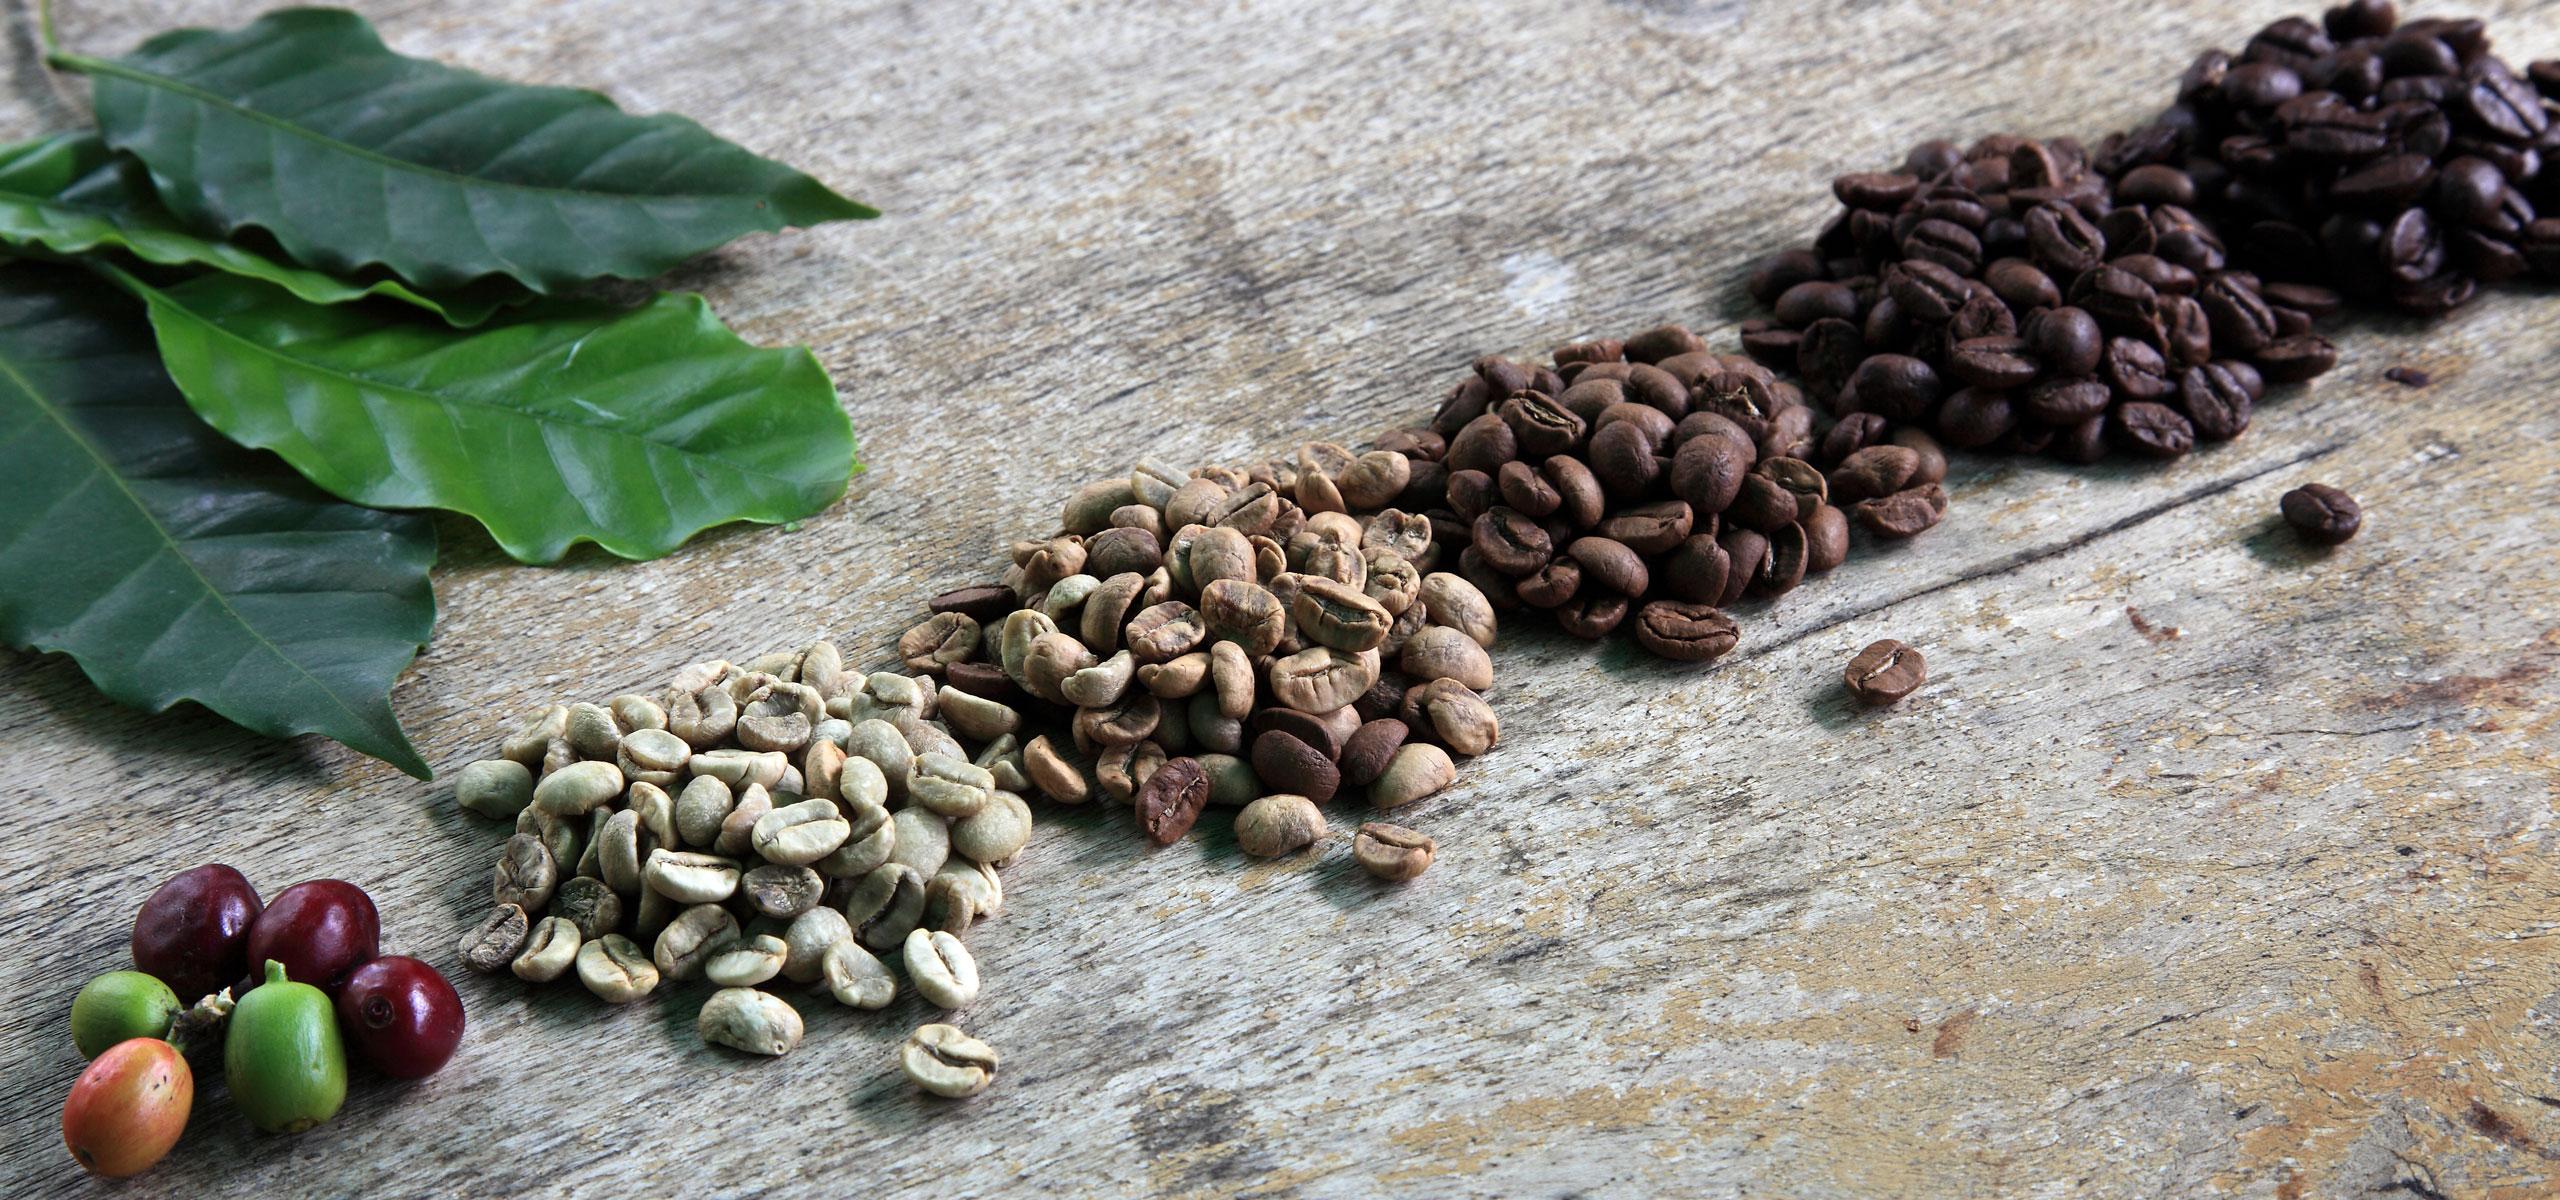 La Ruga –Die Kaffeerösterei –Slider, Sorten